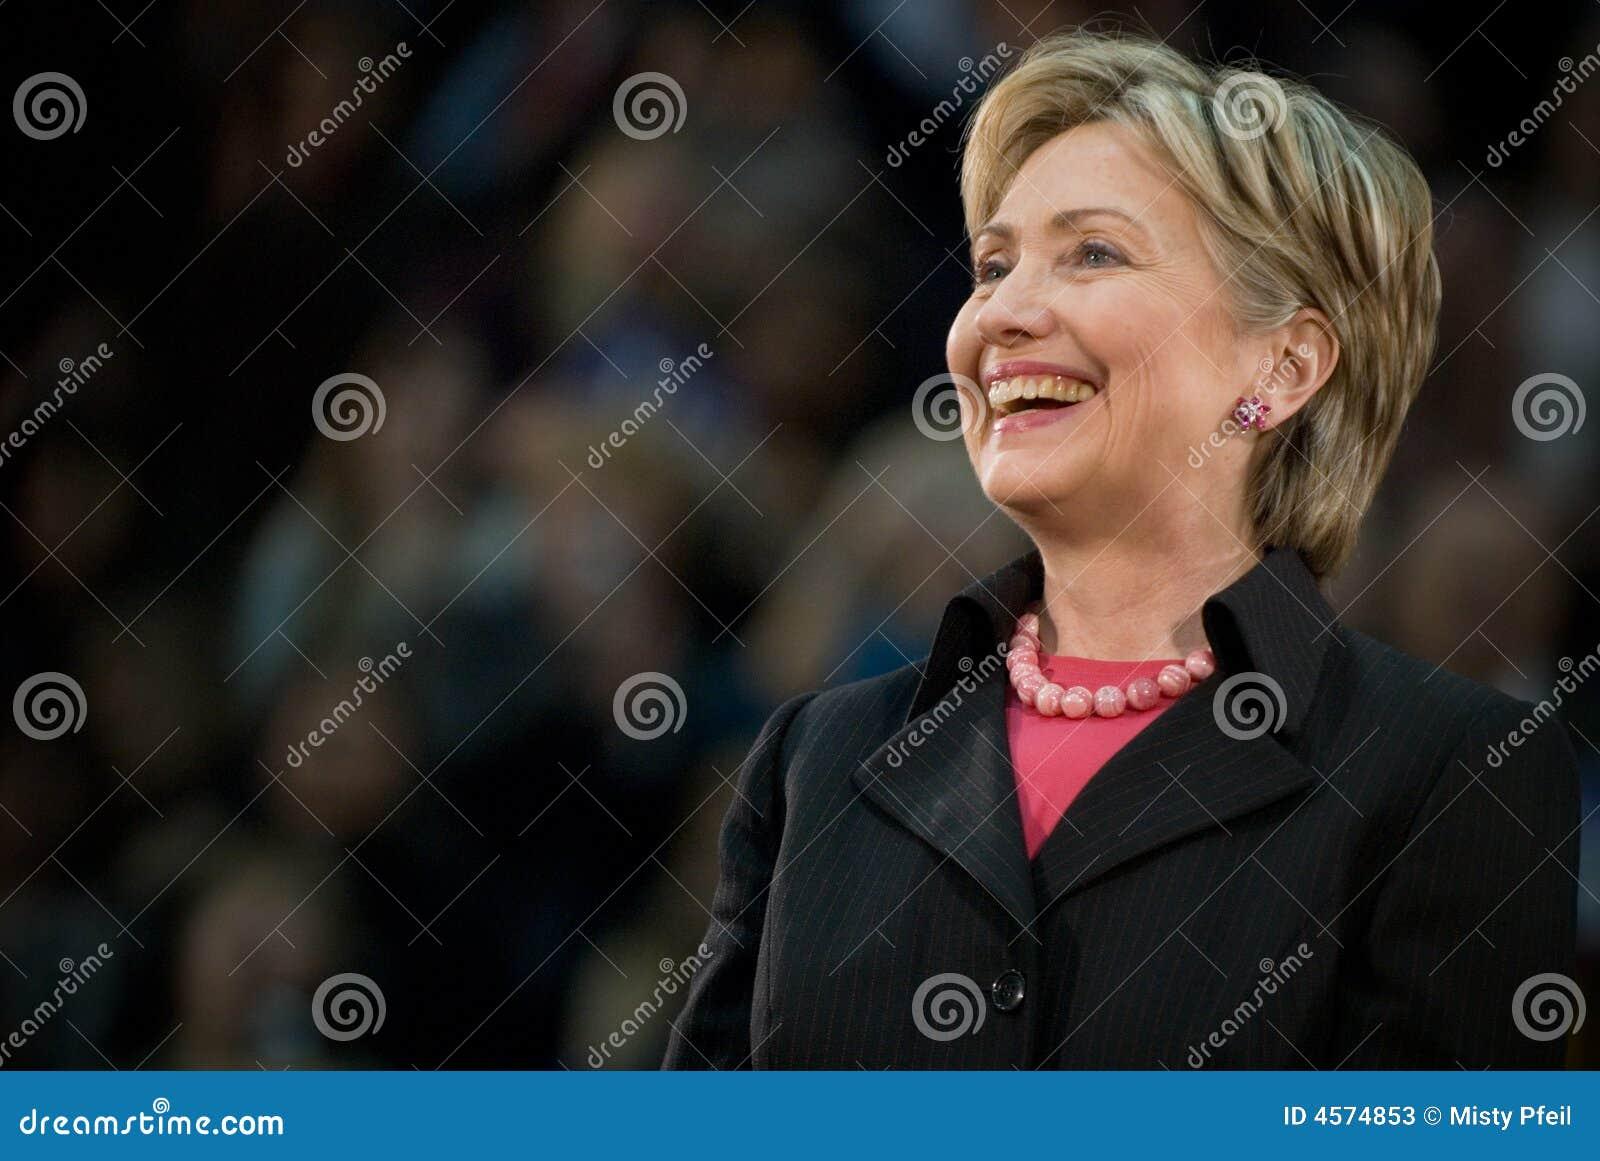 Hillary Clinton - Horizontal Smiling 2